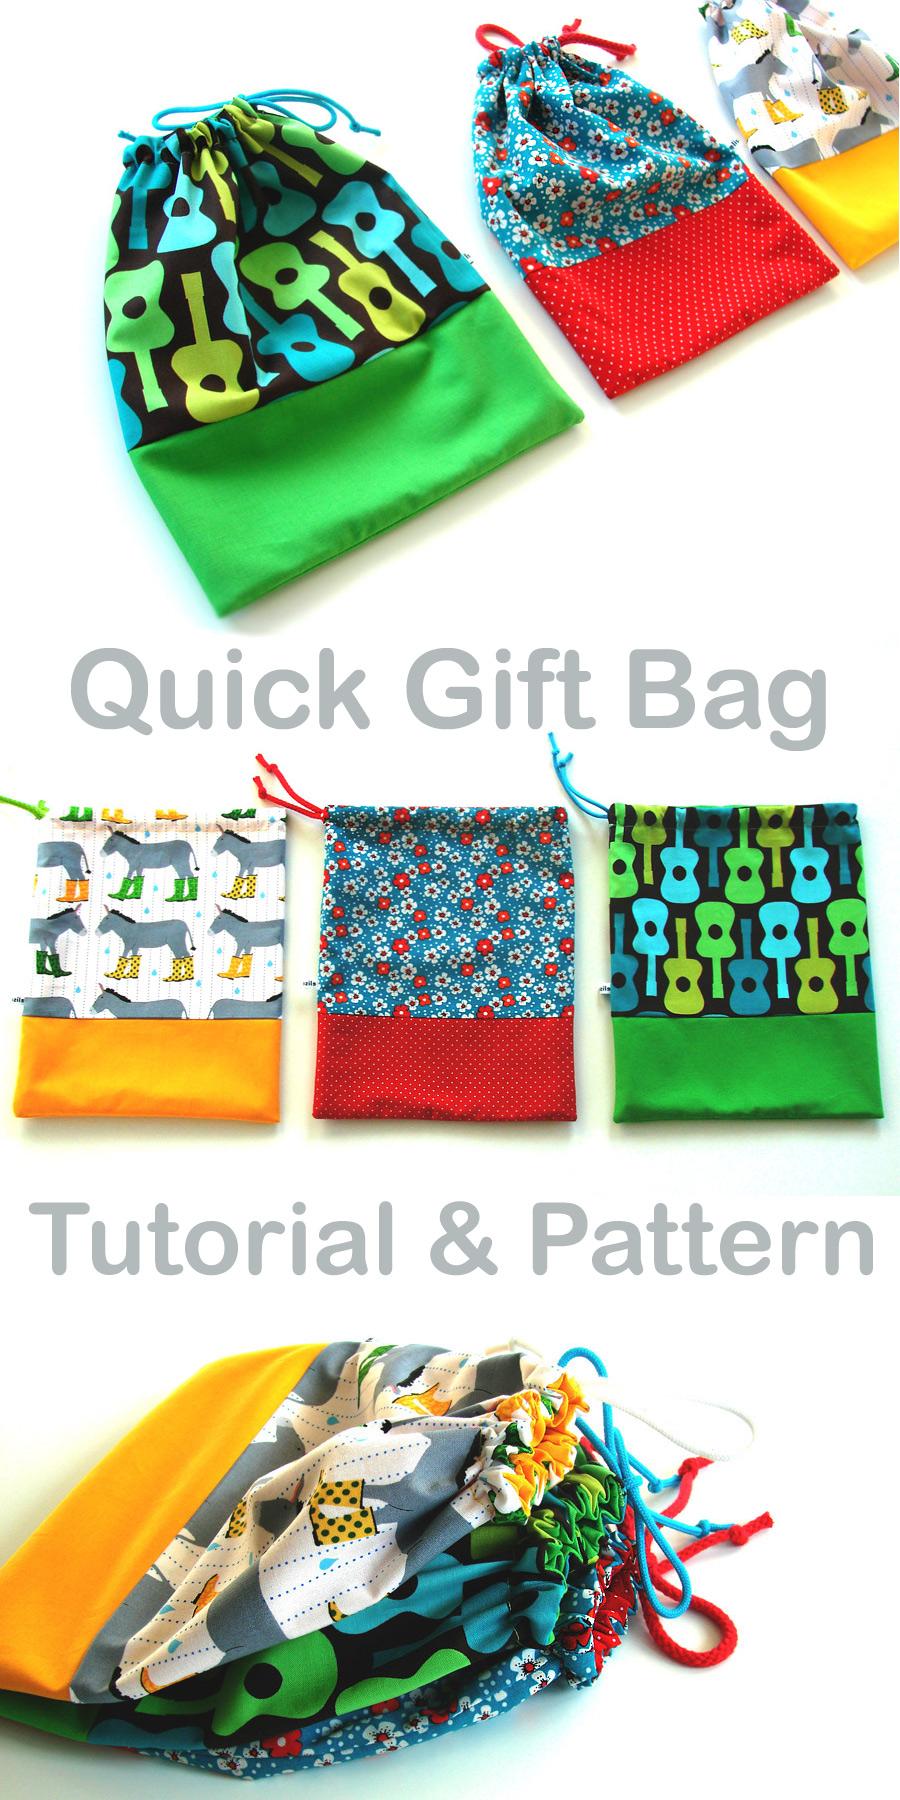 Quick Gift Bag Tutorial & Pattern